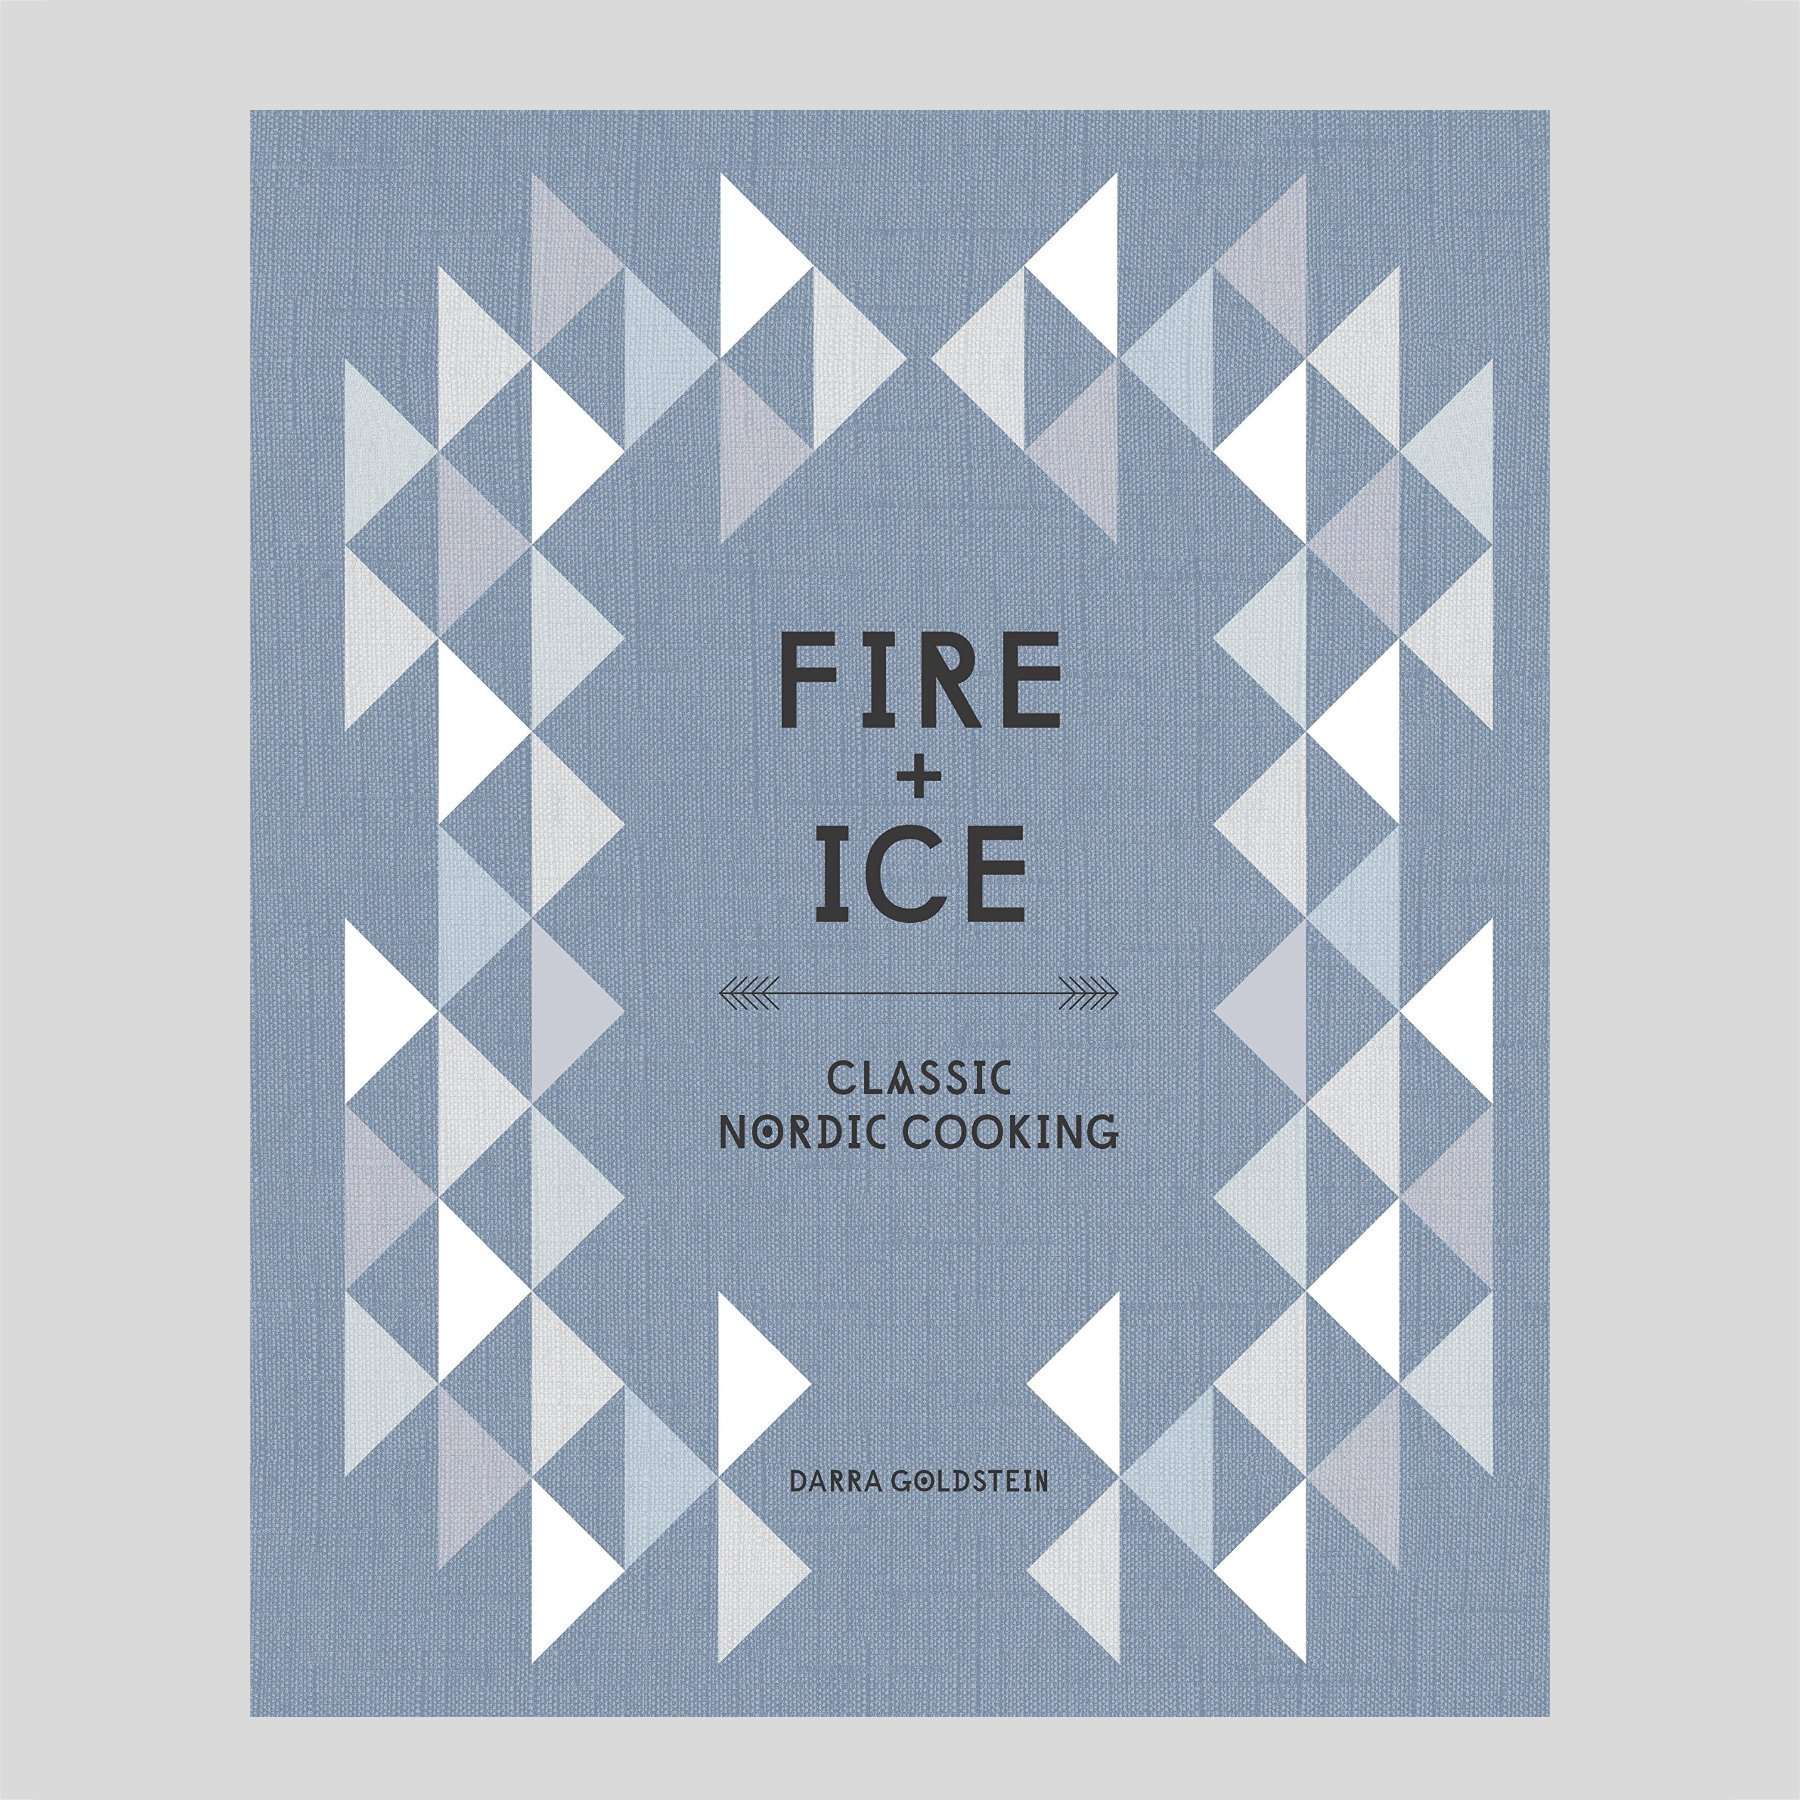 scandinavian feeling best nordic cookbooks fire ice